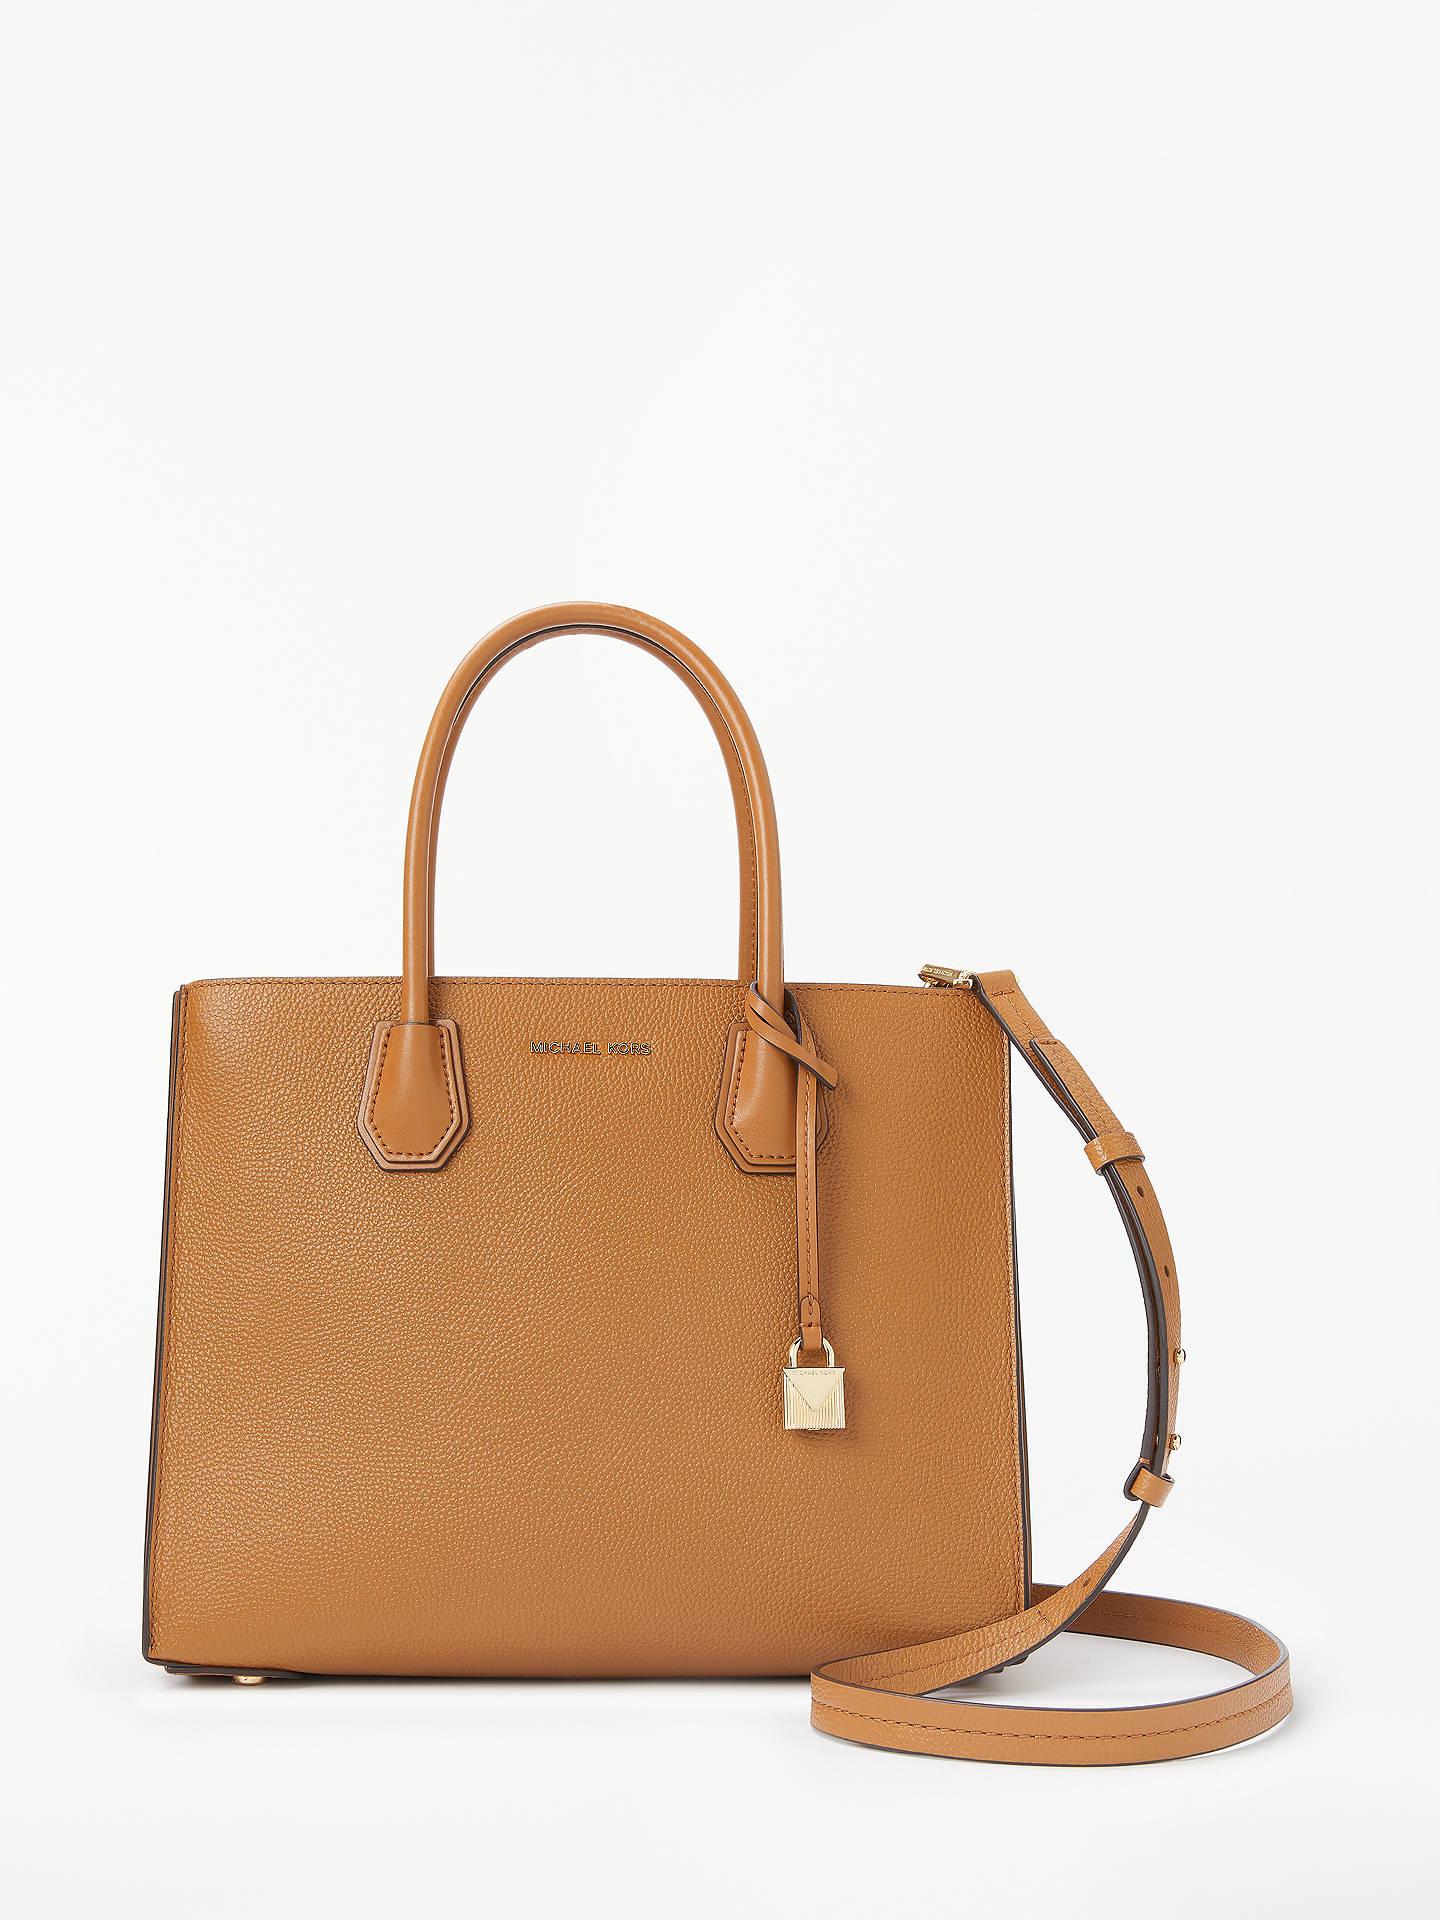 39c405da23e5 Buy MICHAEL Michael Kors Mercer Large Leather Tote Bag, Acorn Online at  johnlewis.com ...